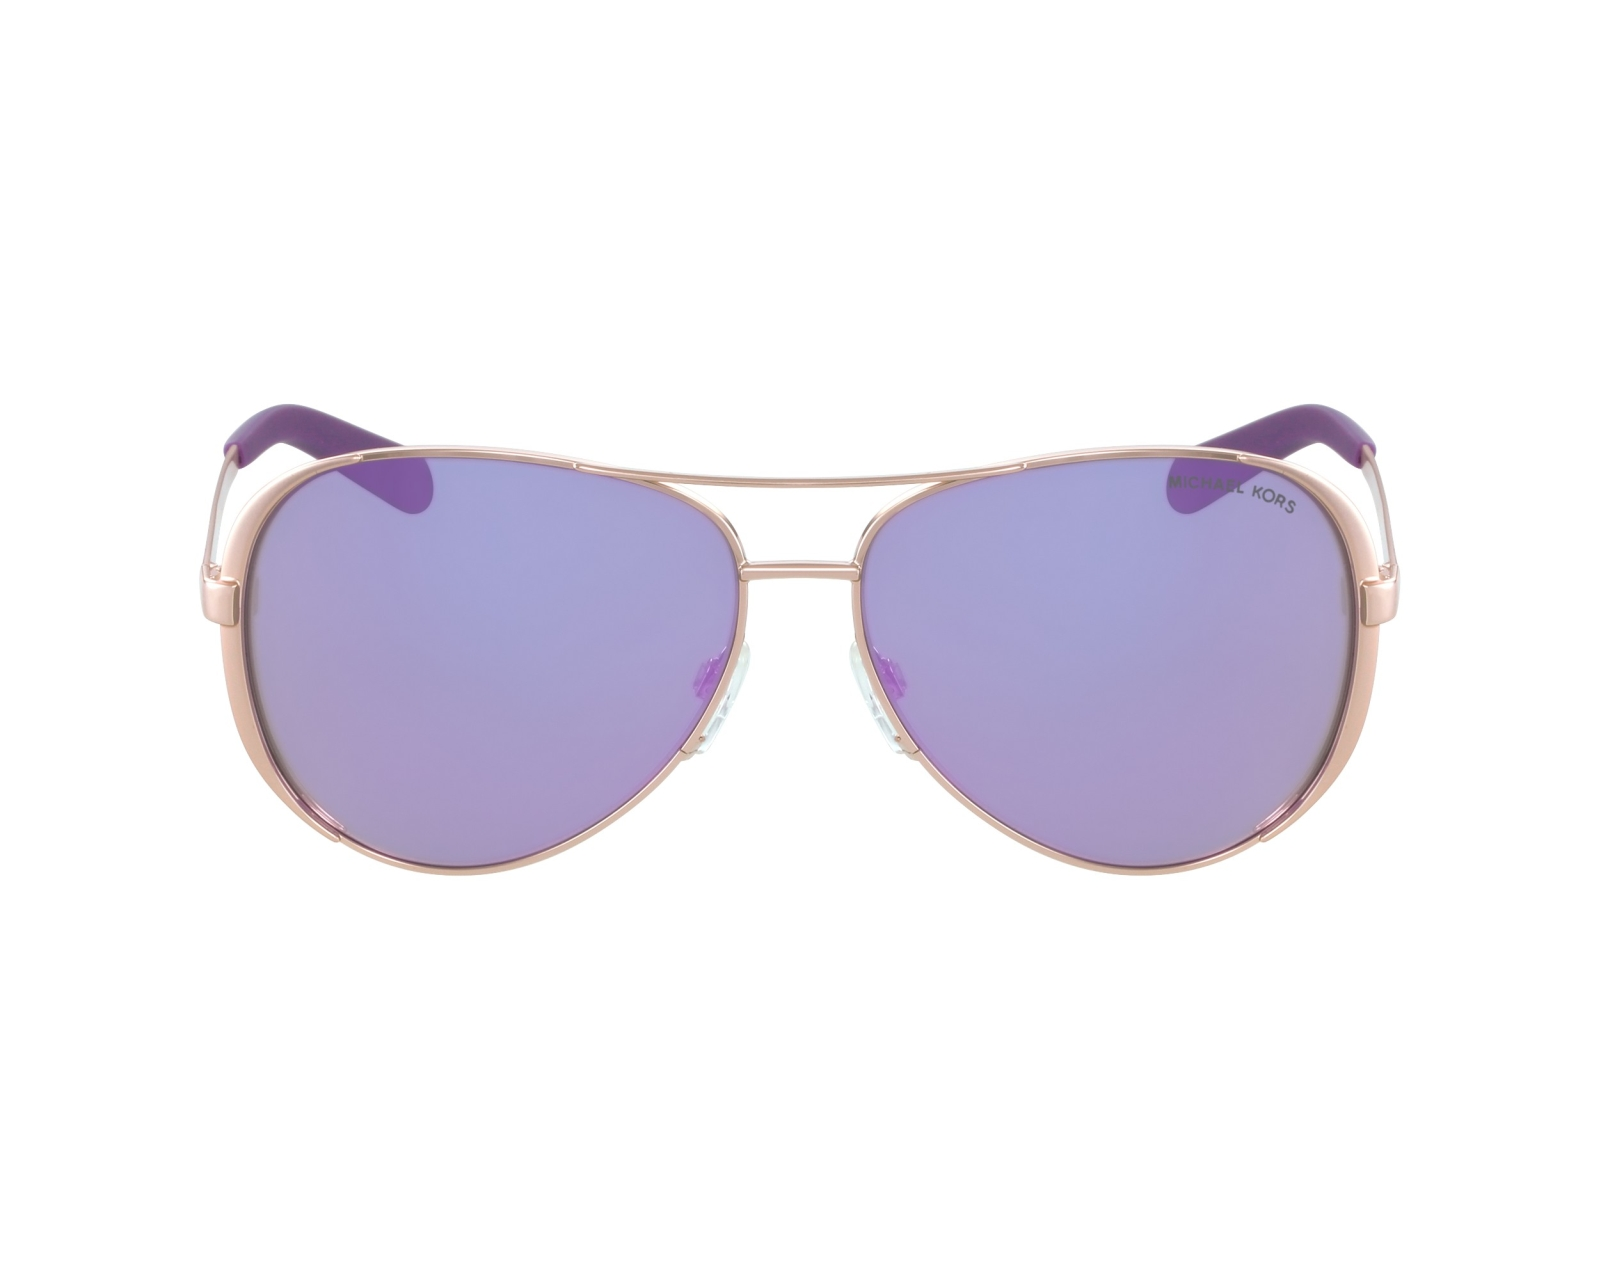 0ec2c3cac09e Sunglasses Michael Kors MK-5004 10034V - Gold profile view